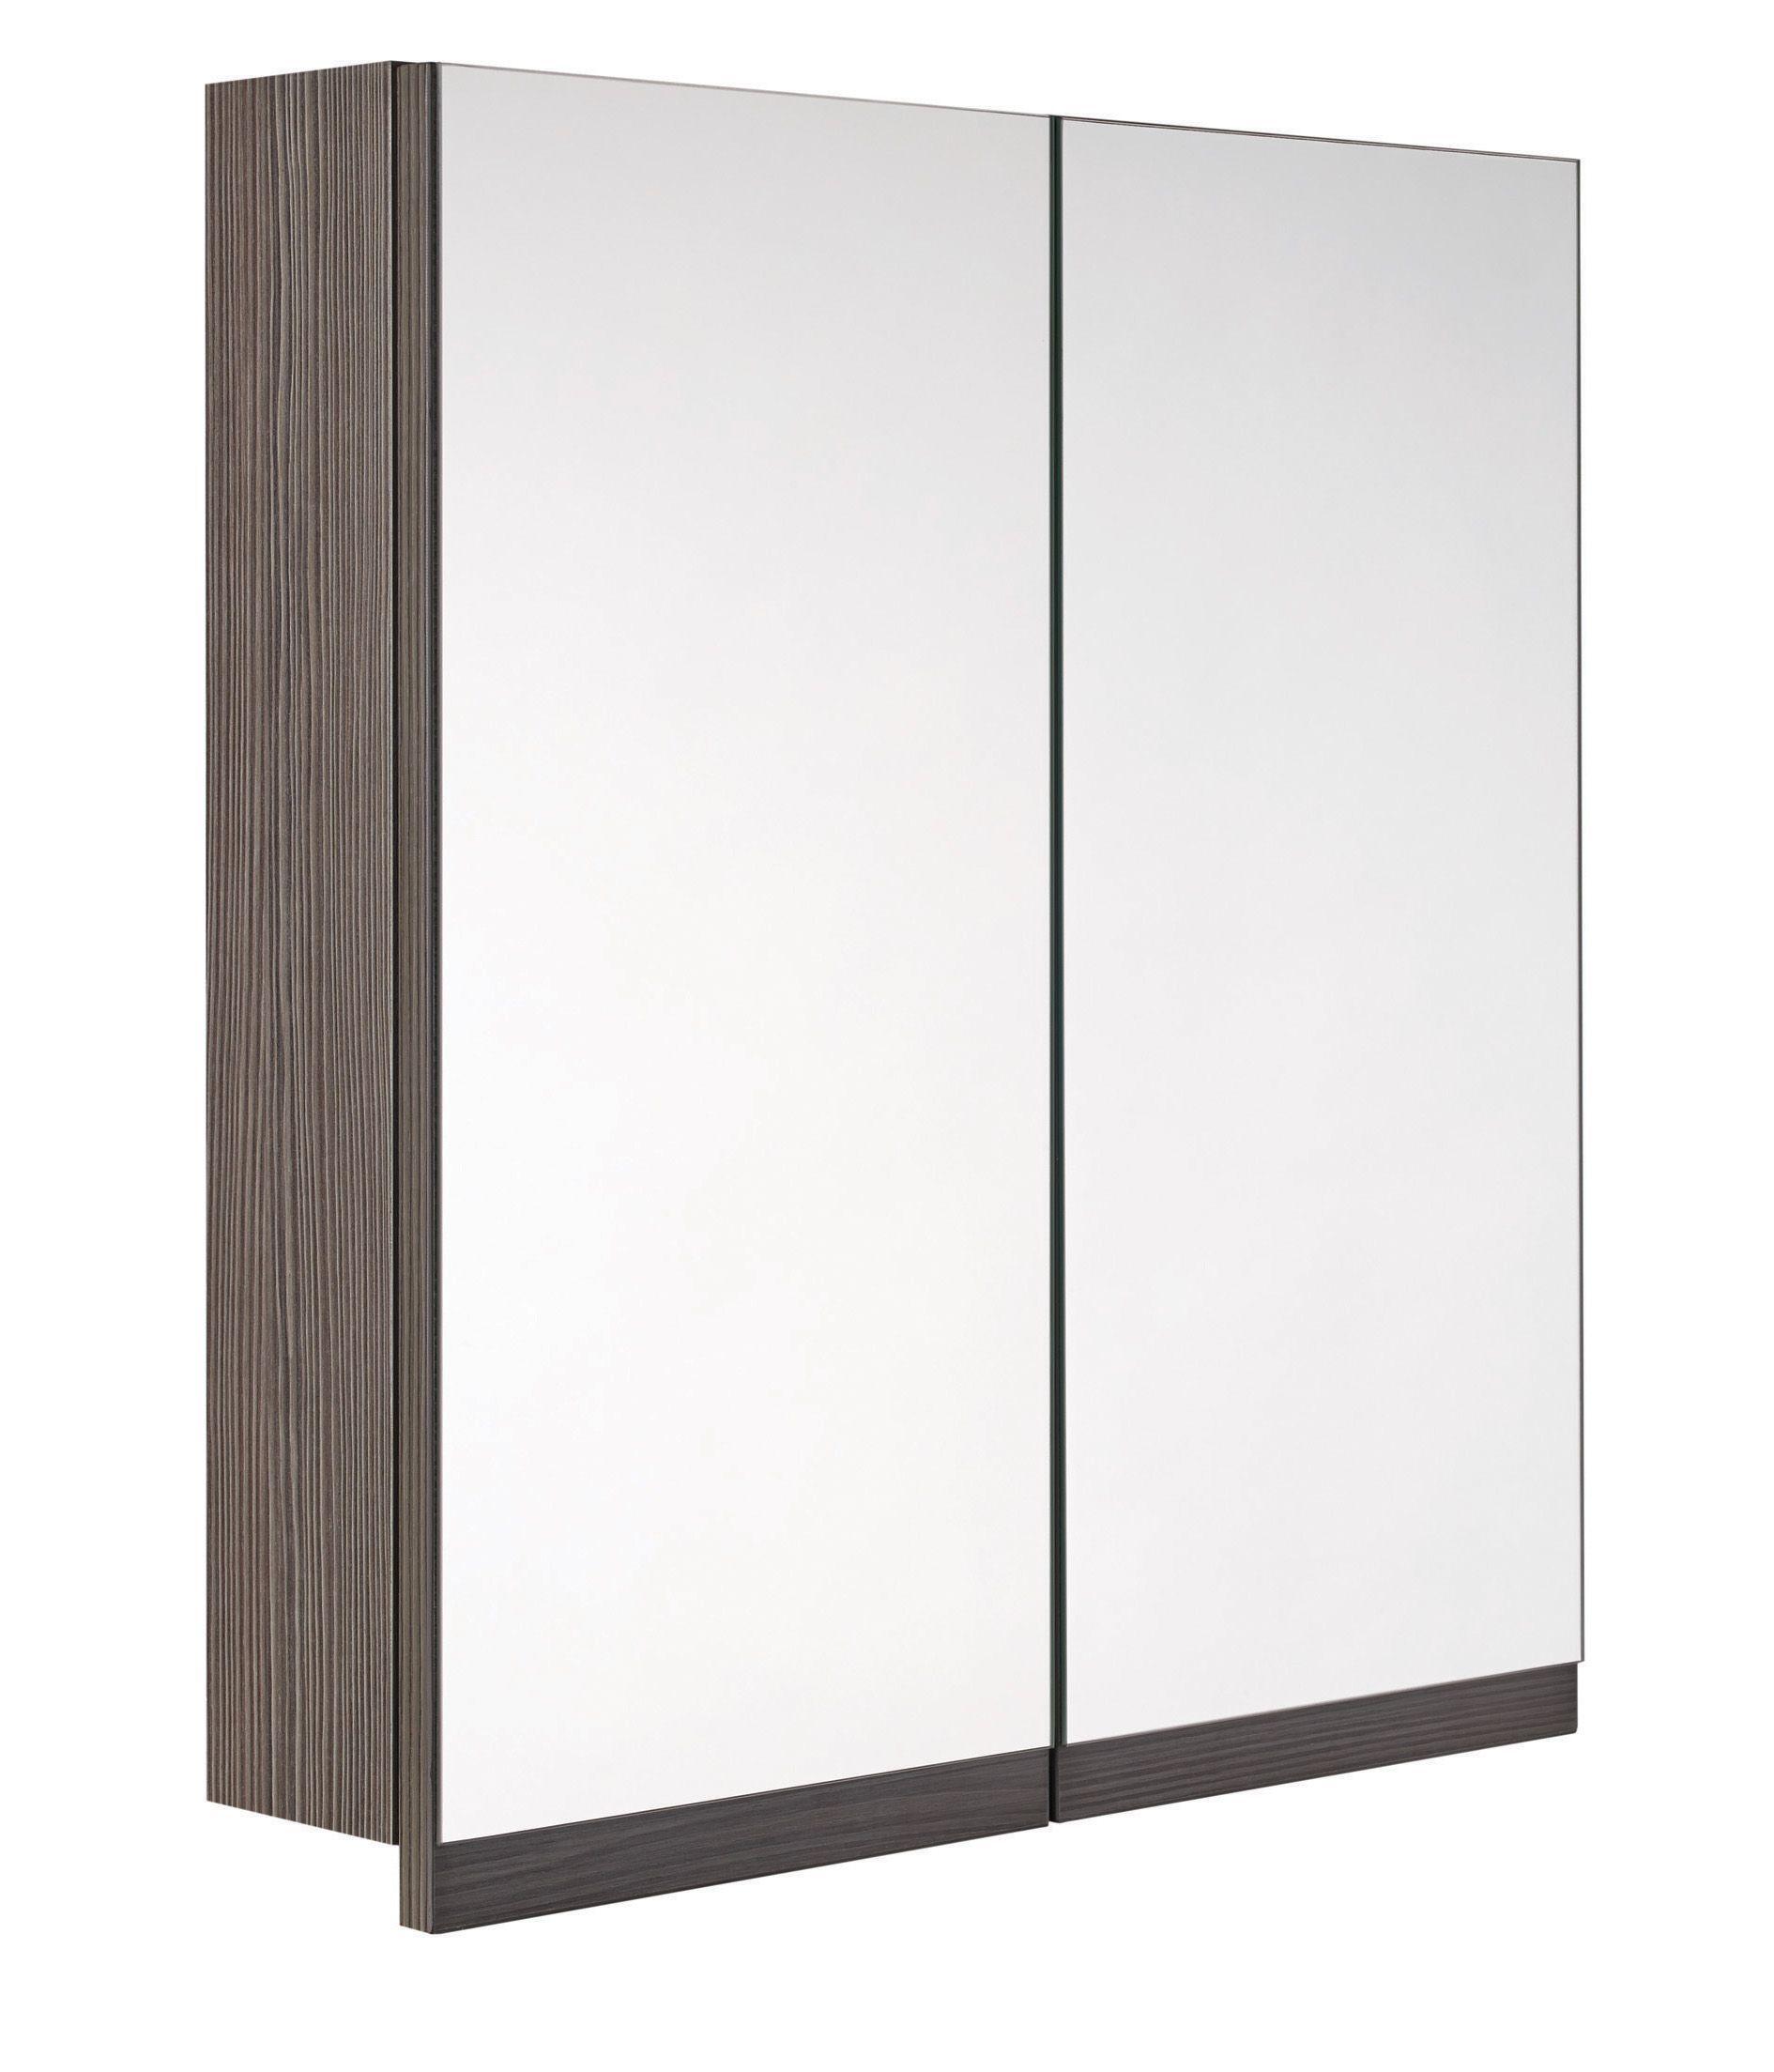 Cooke Lewis Ardesio Double Door Bodega Grey Mirror Cabinet  # Muebles Cic Bodega